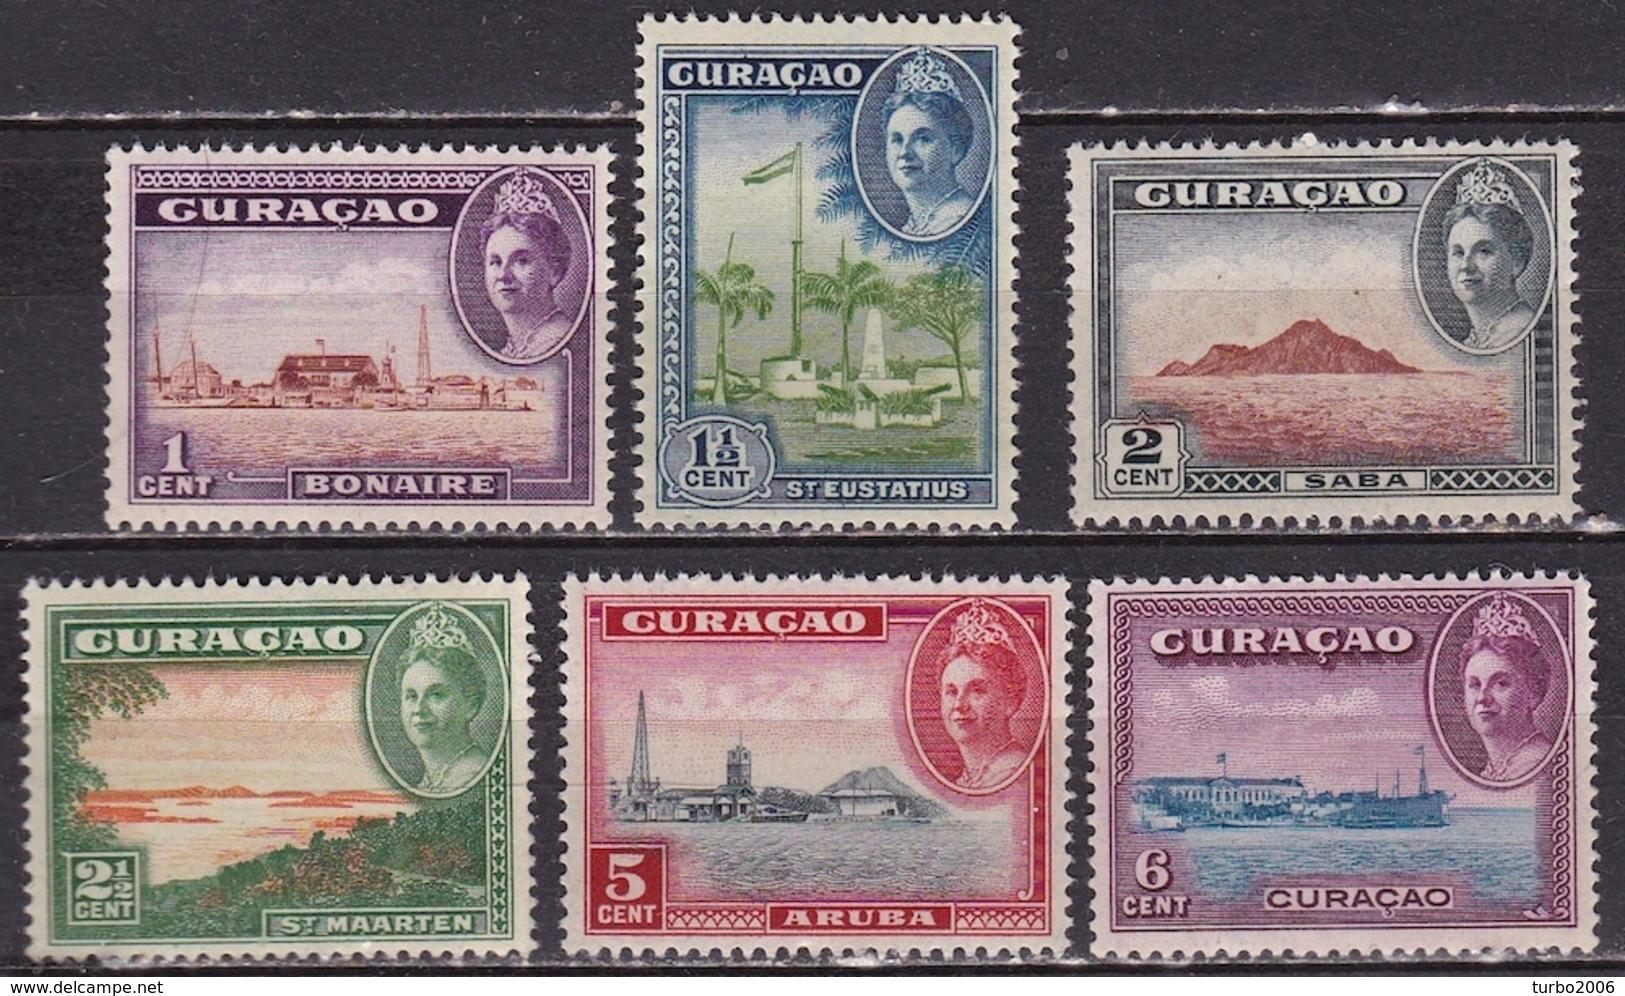 Curacao 1943 Eilanden Complete Postfrisse Serie NVPH 158 / 163 - Curaçao, Nederlandse Antillen, Aruba